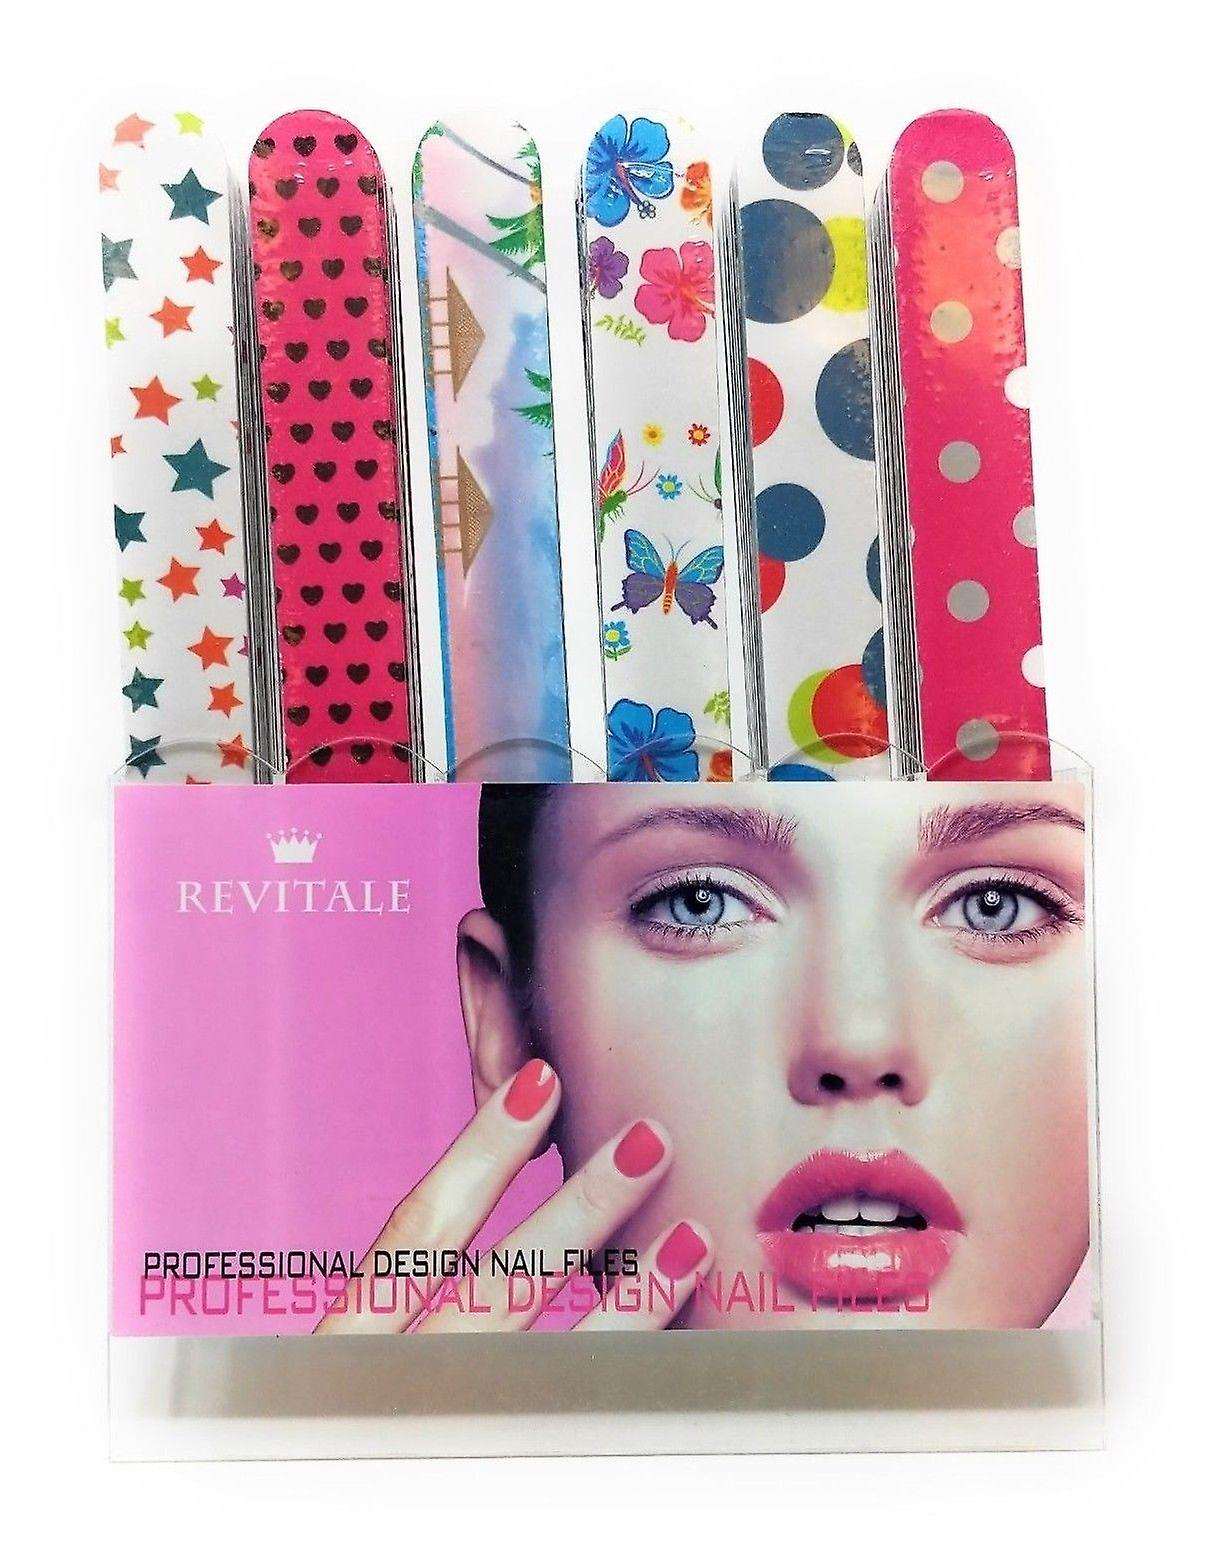 Revitale Professional Design Nail Files x 6 Designs (Pattern Design)